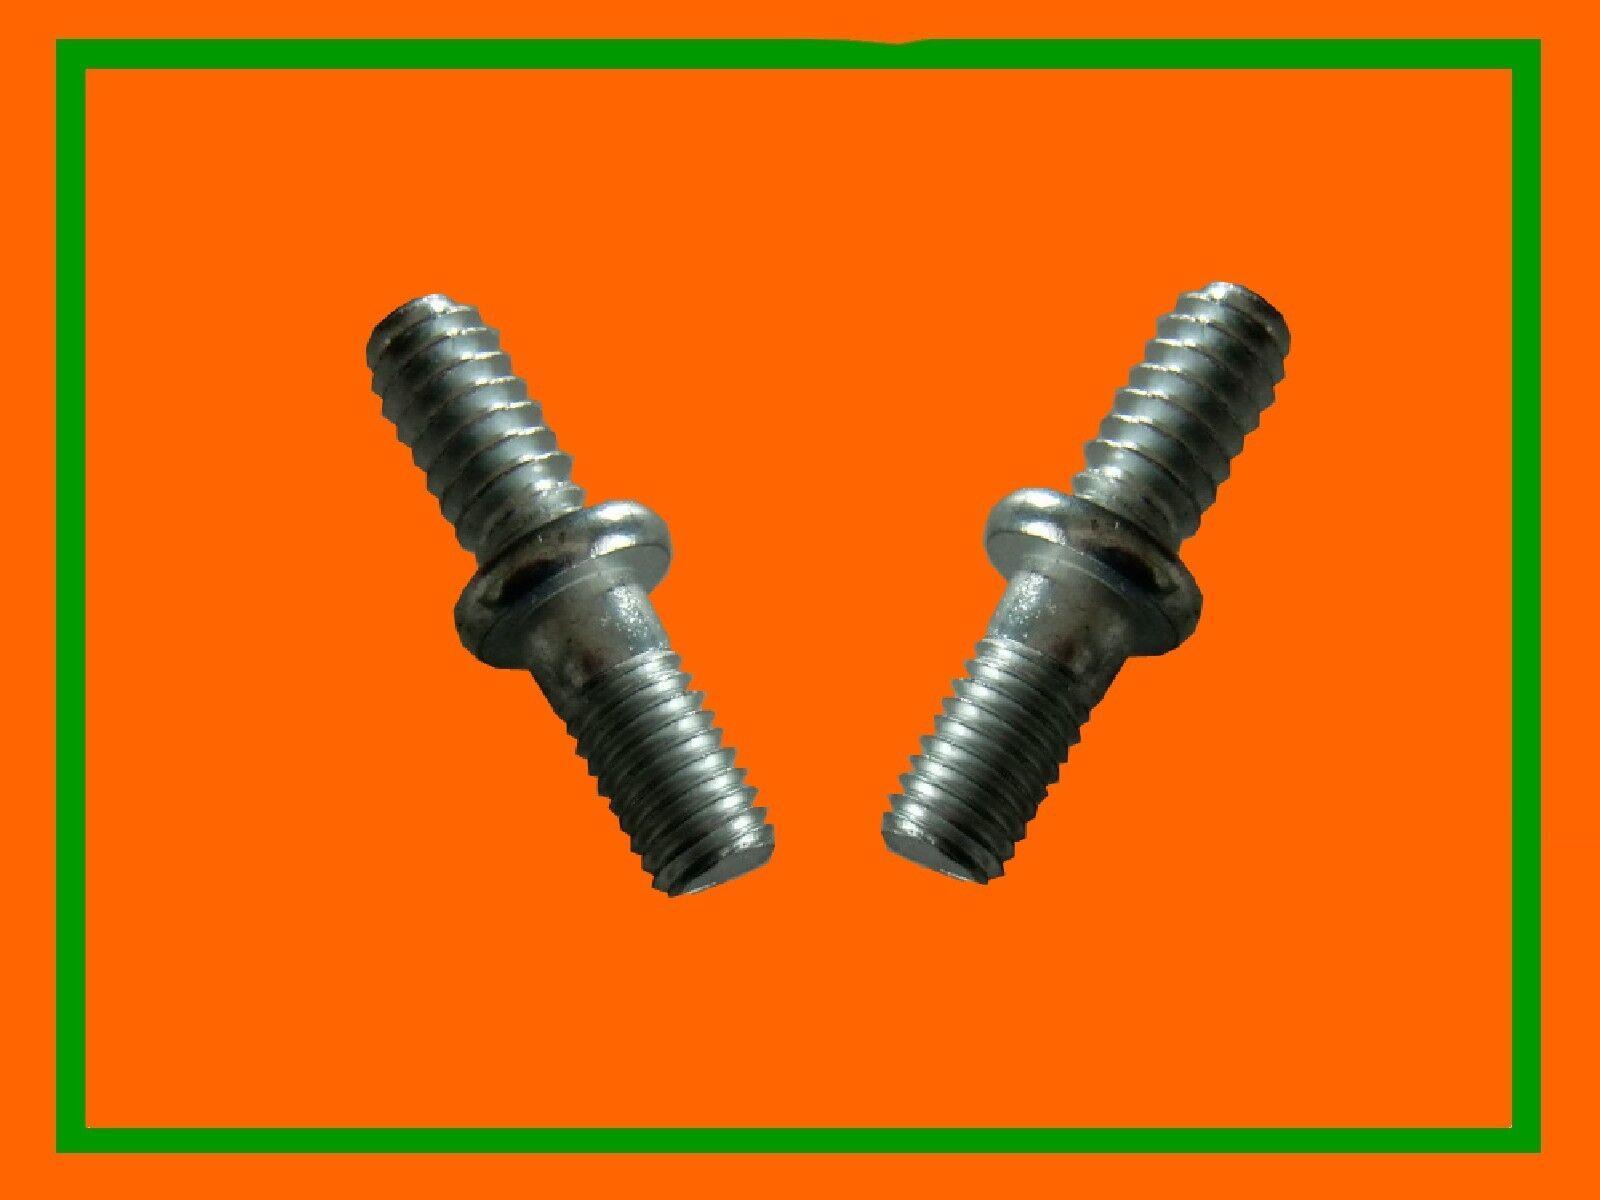 Benzin Pumpe Primer Knopf für STIHL 021 023 025 MS210 MS230 MS250 MS210 230 DHL